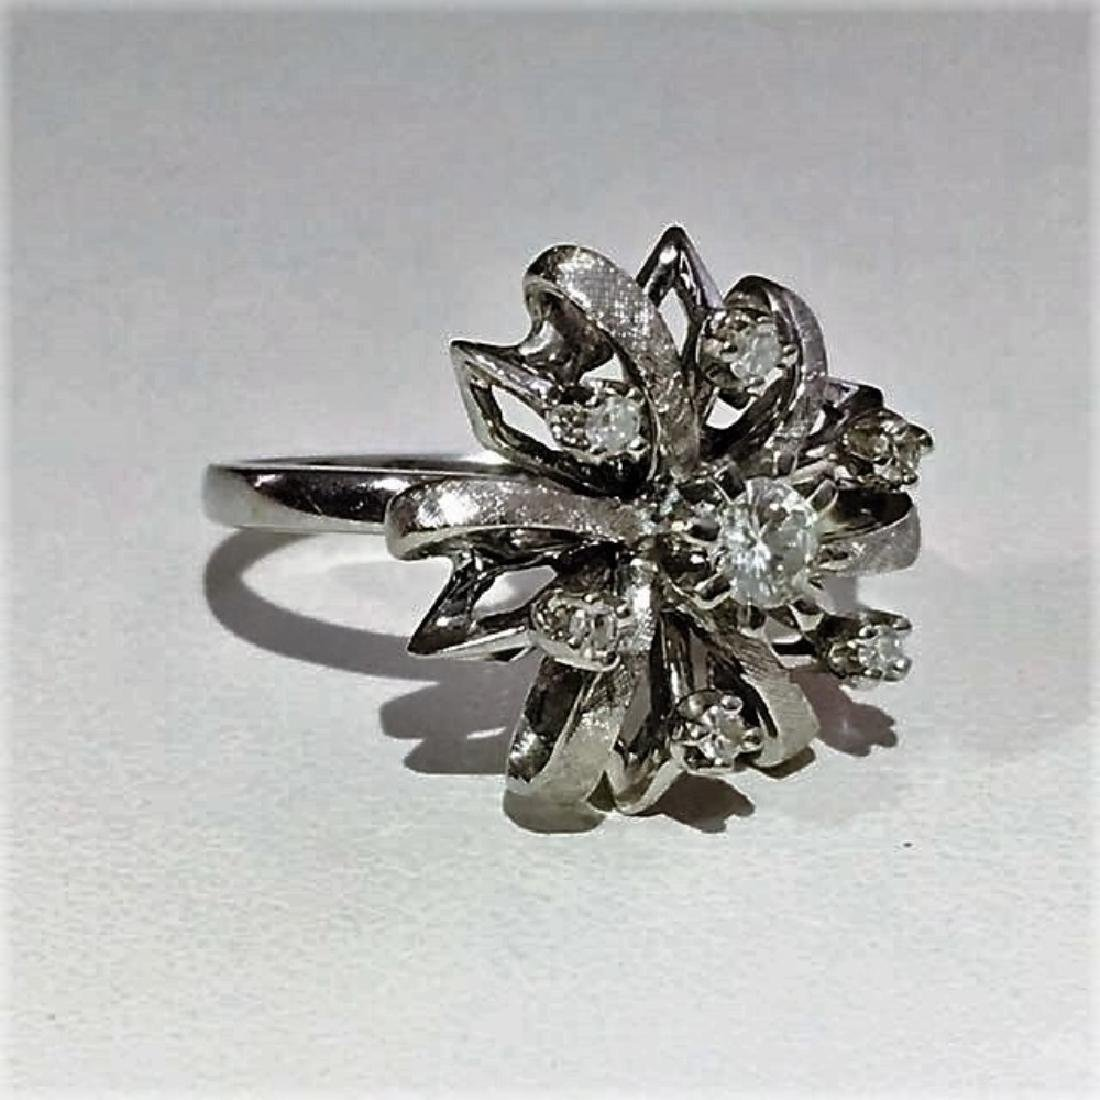 14K White Gold Cocktail Diamond Ring - 2